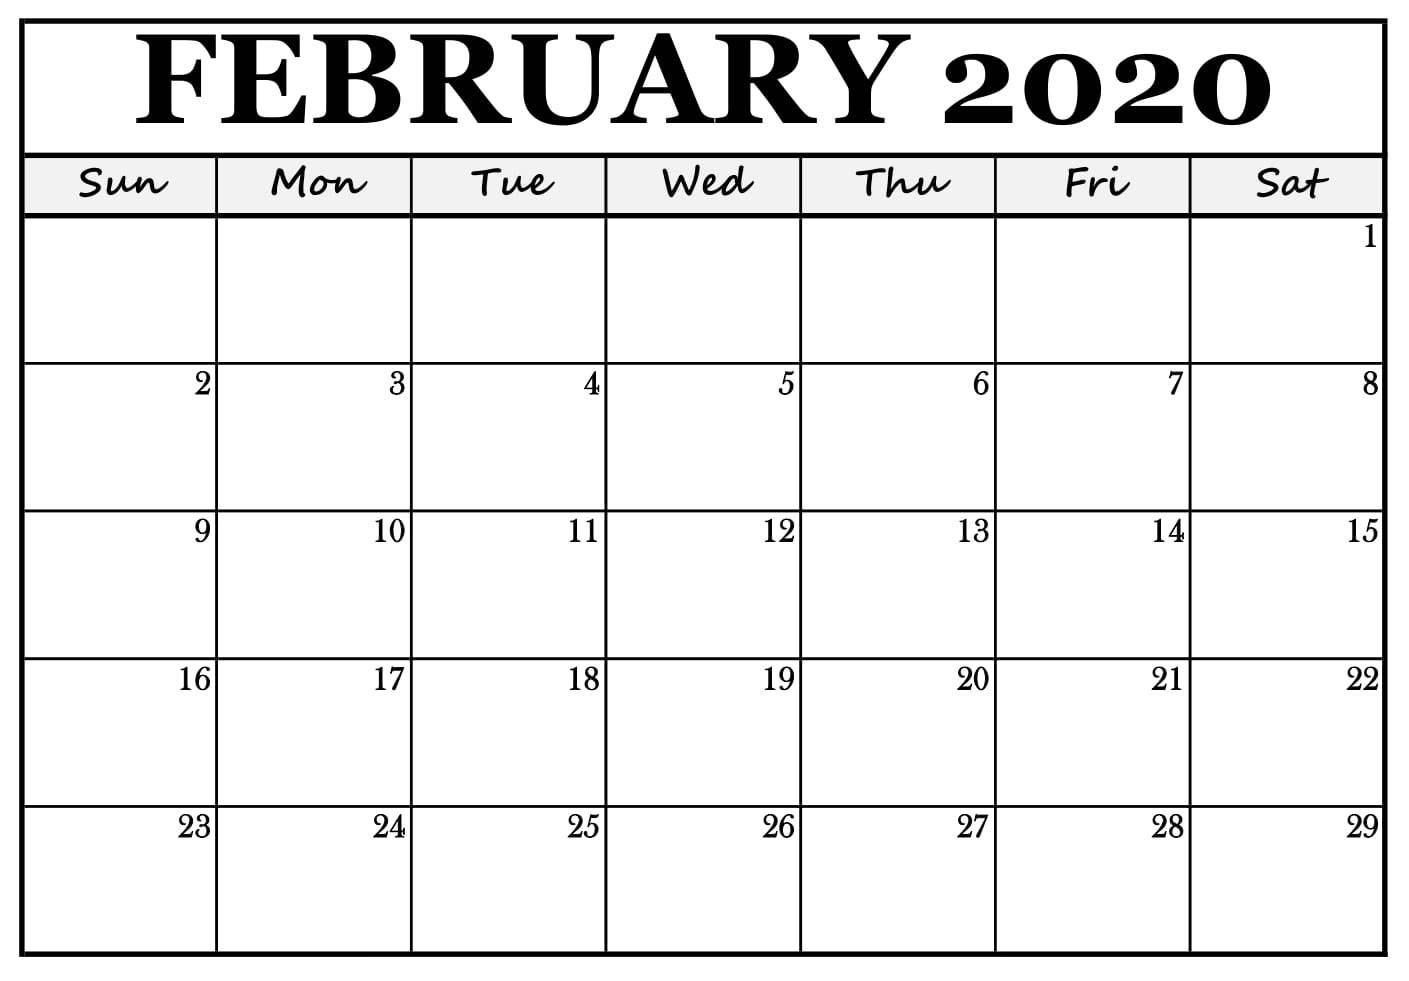 Blank Feb 2020 Printable Calendar